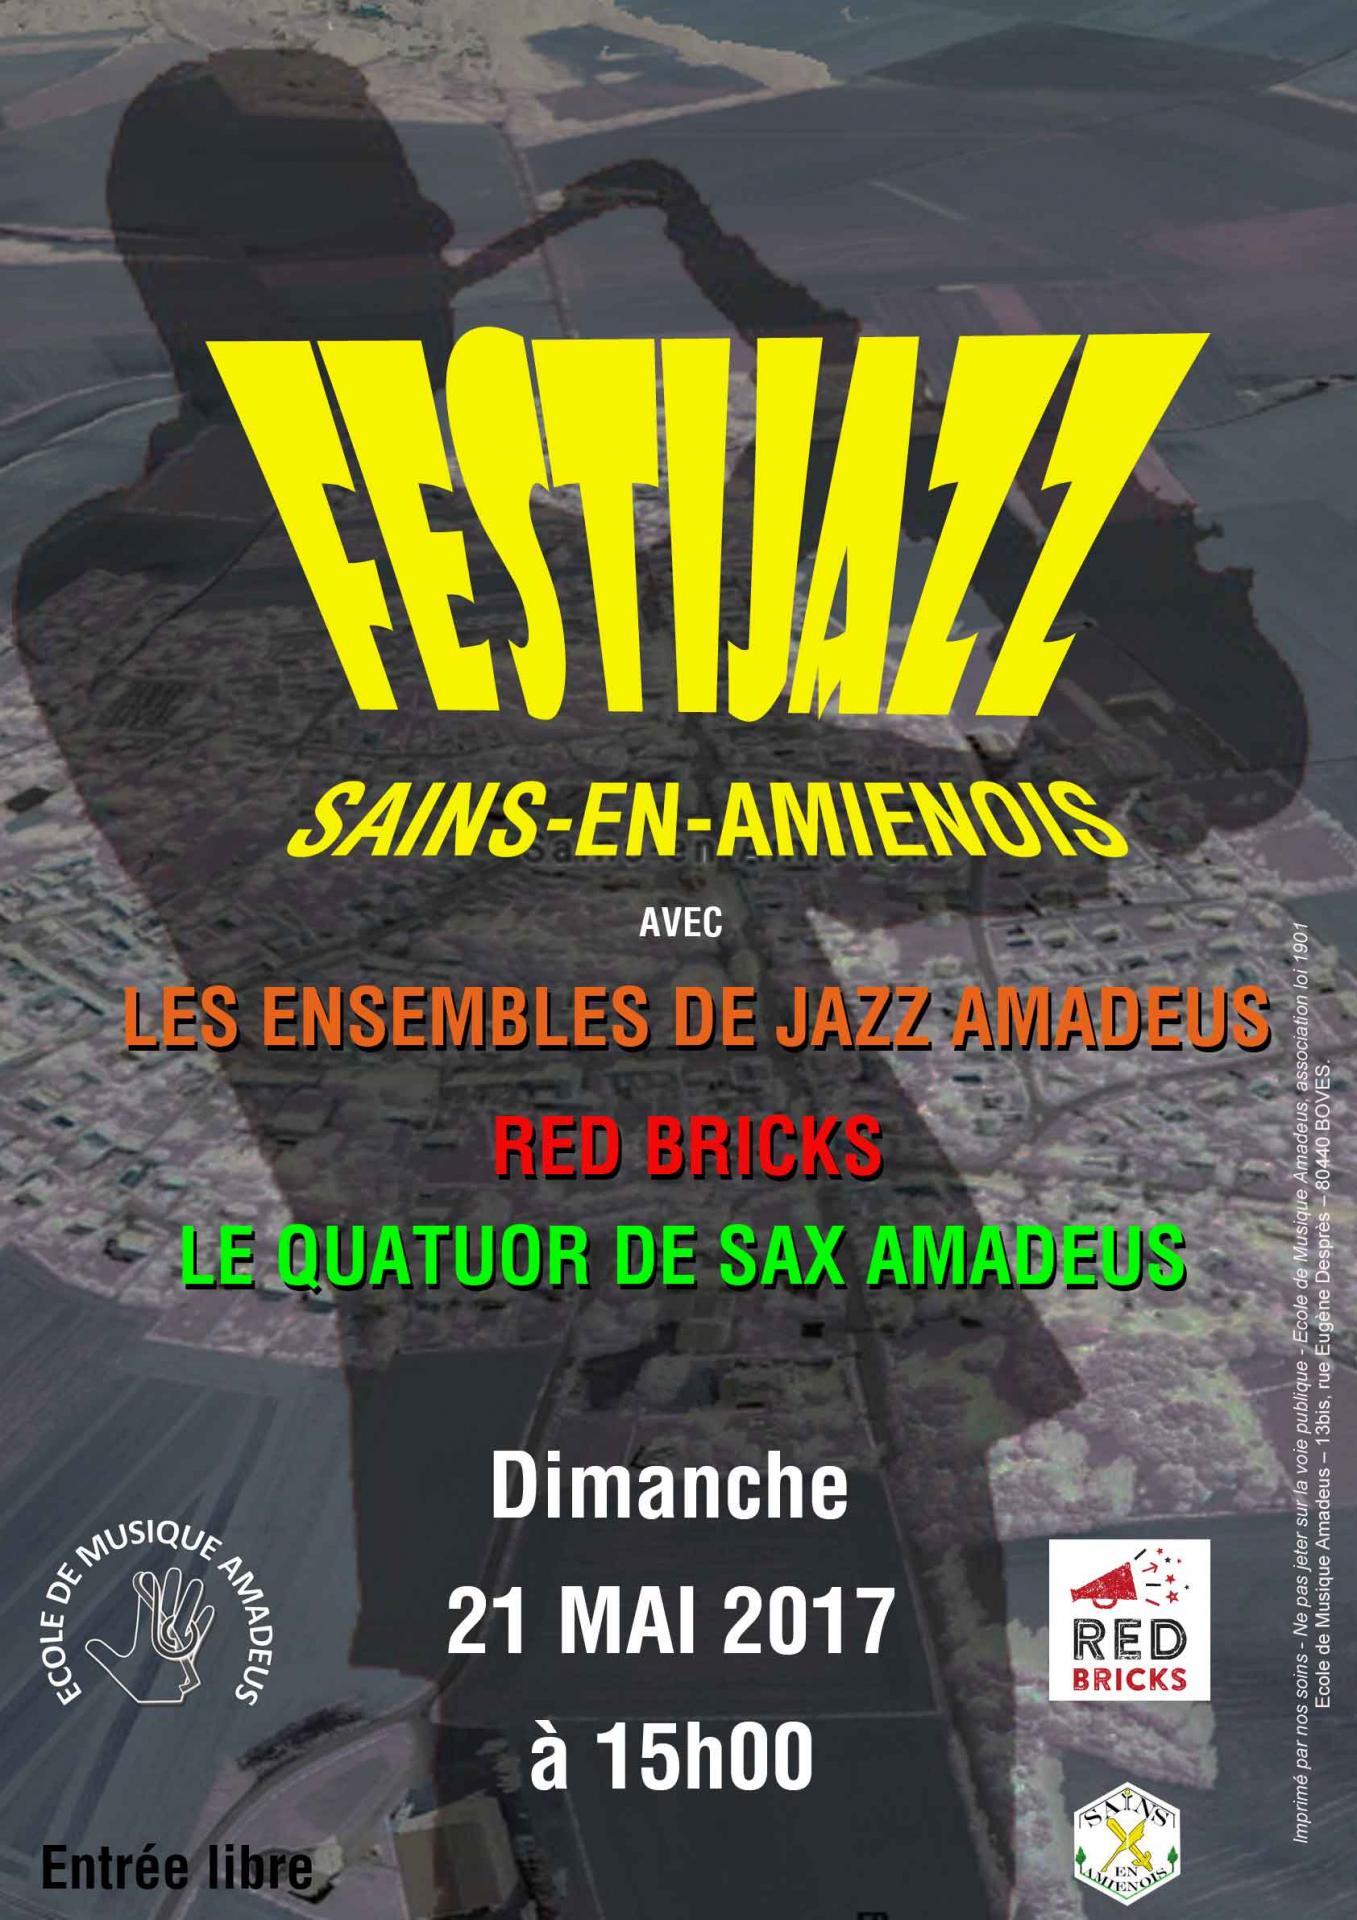 Affiche festi jazz sains